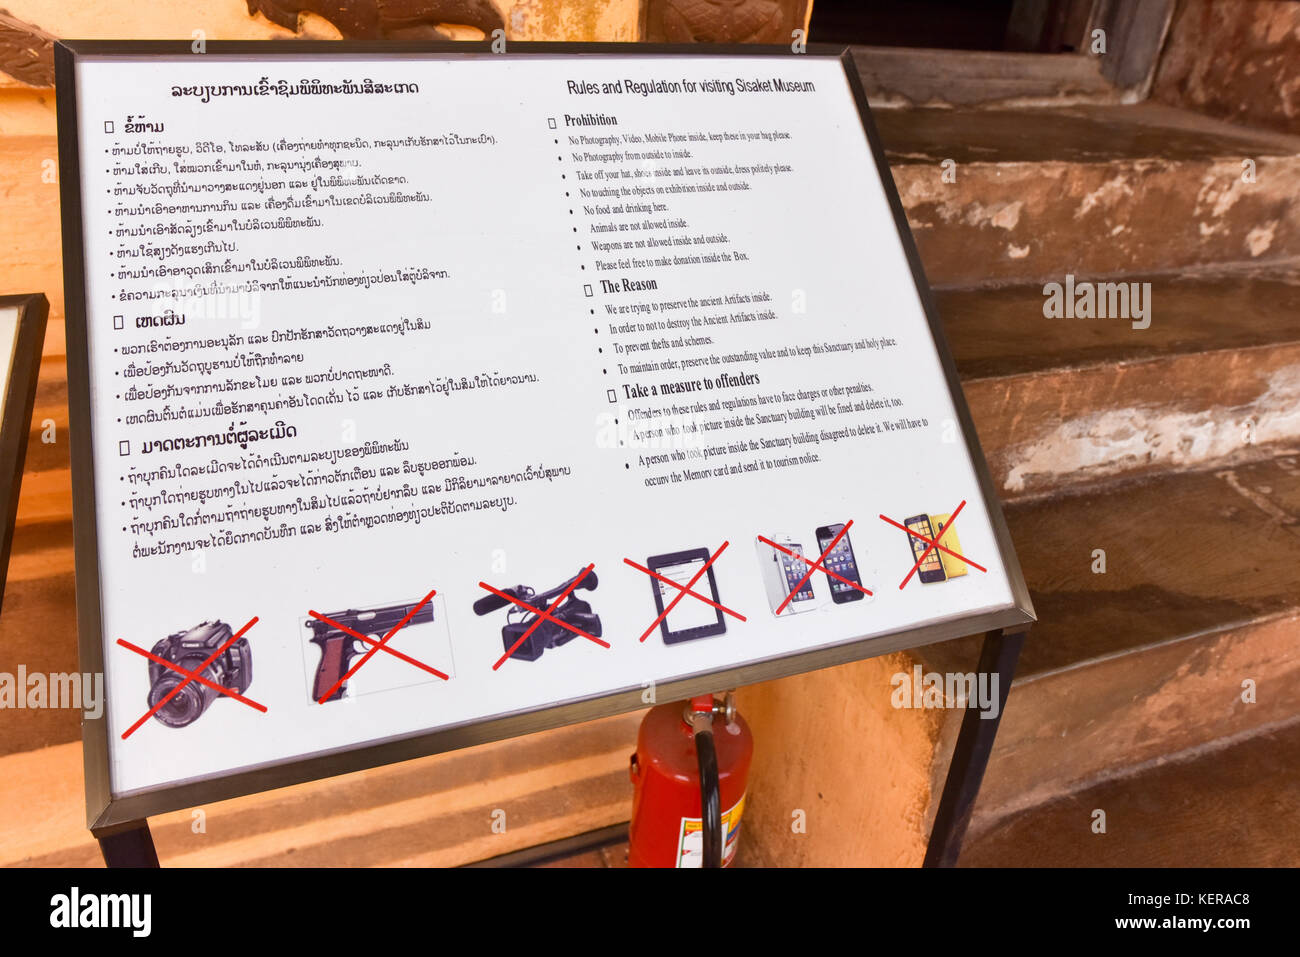 Rule and regulations Museum Vientiane Laos - Stock Image